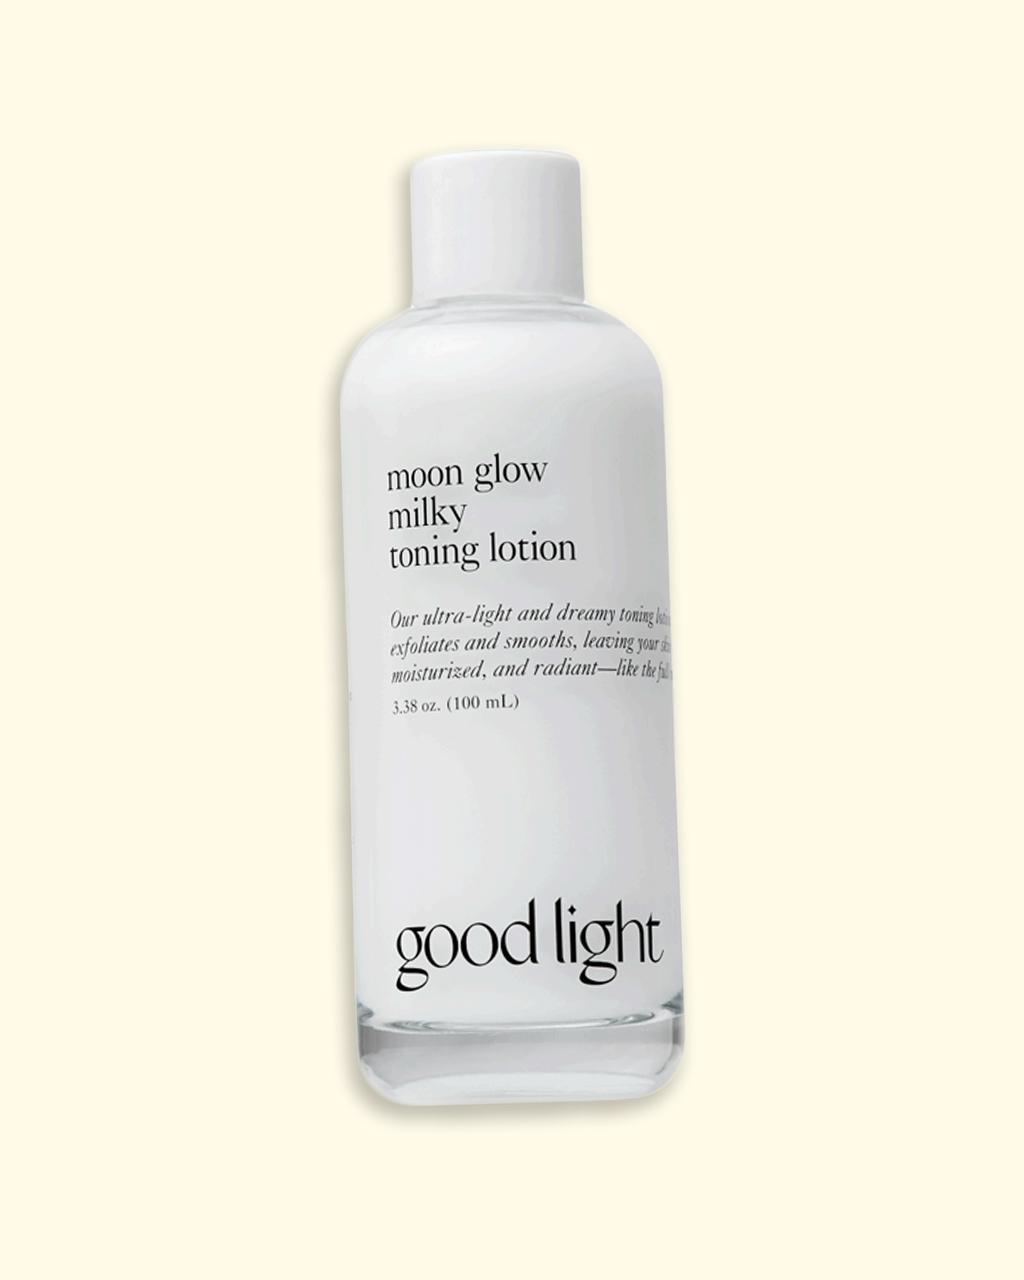 goodlight moon glow milky toning lotion